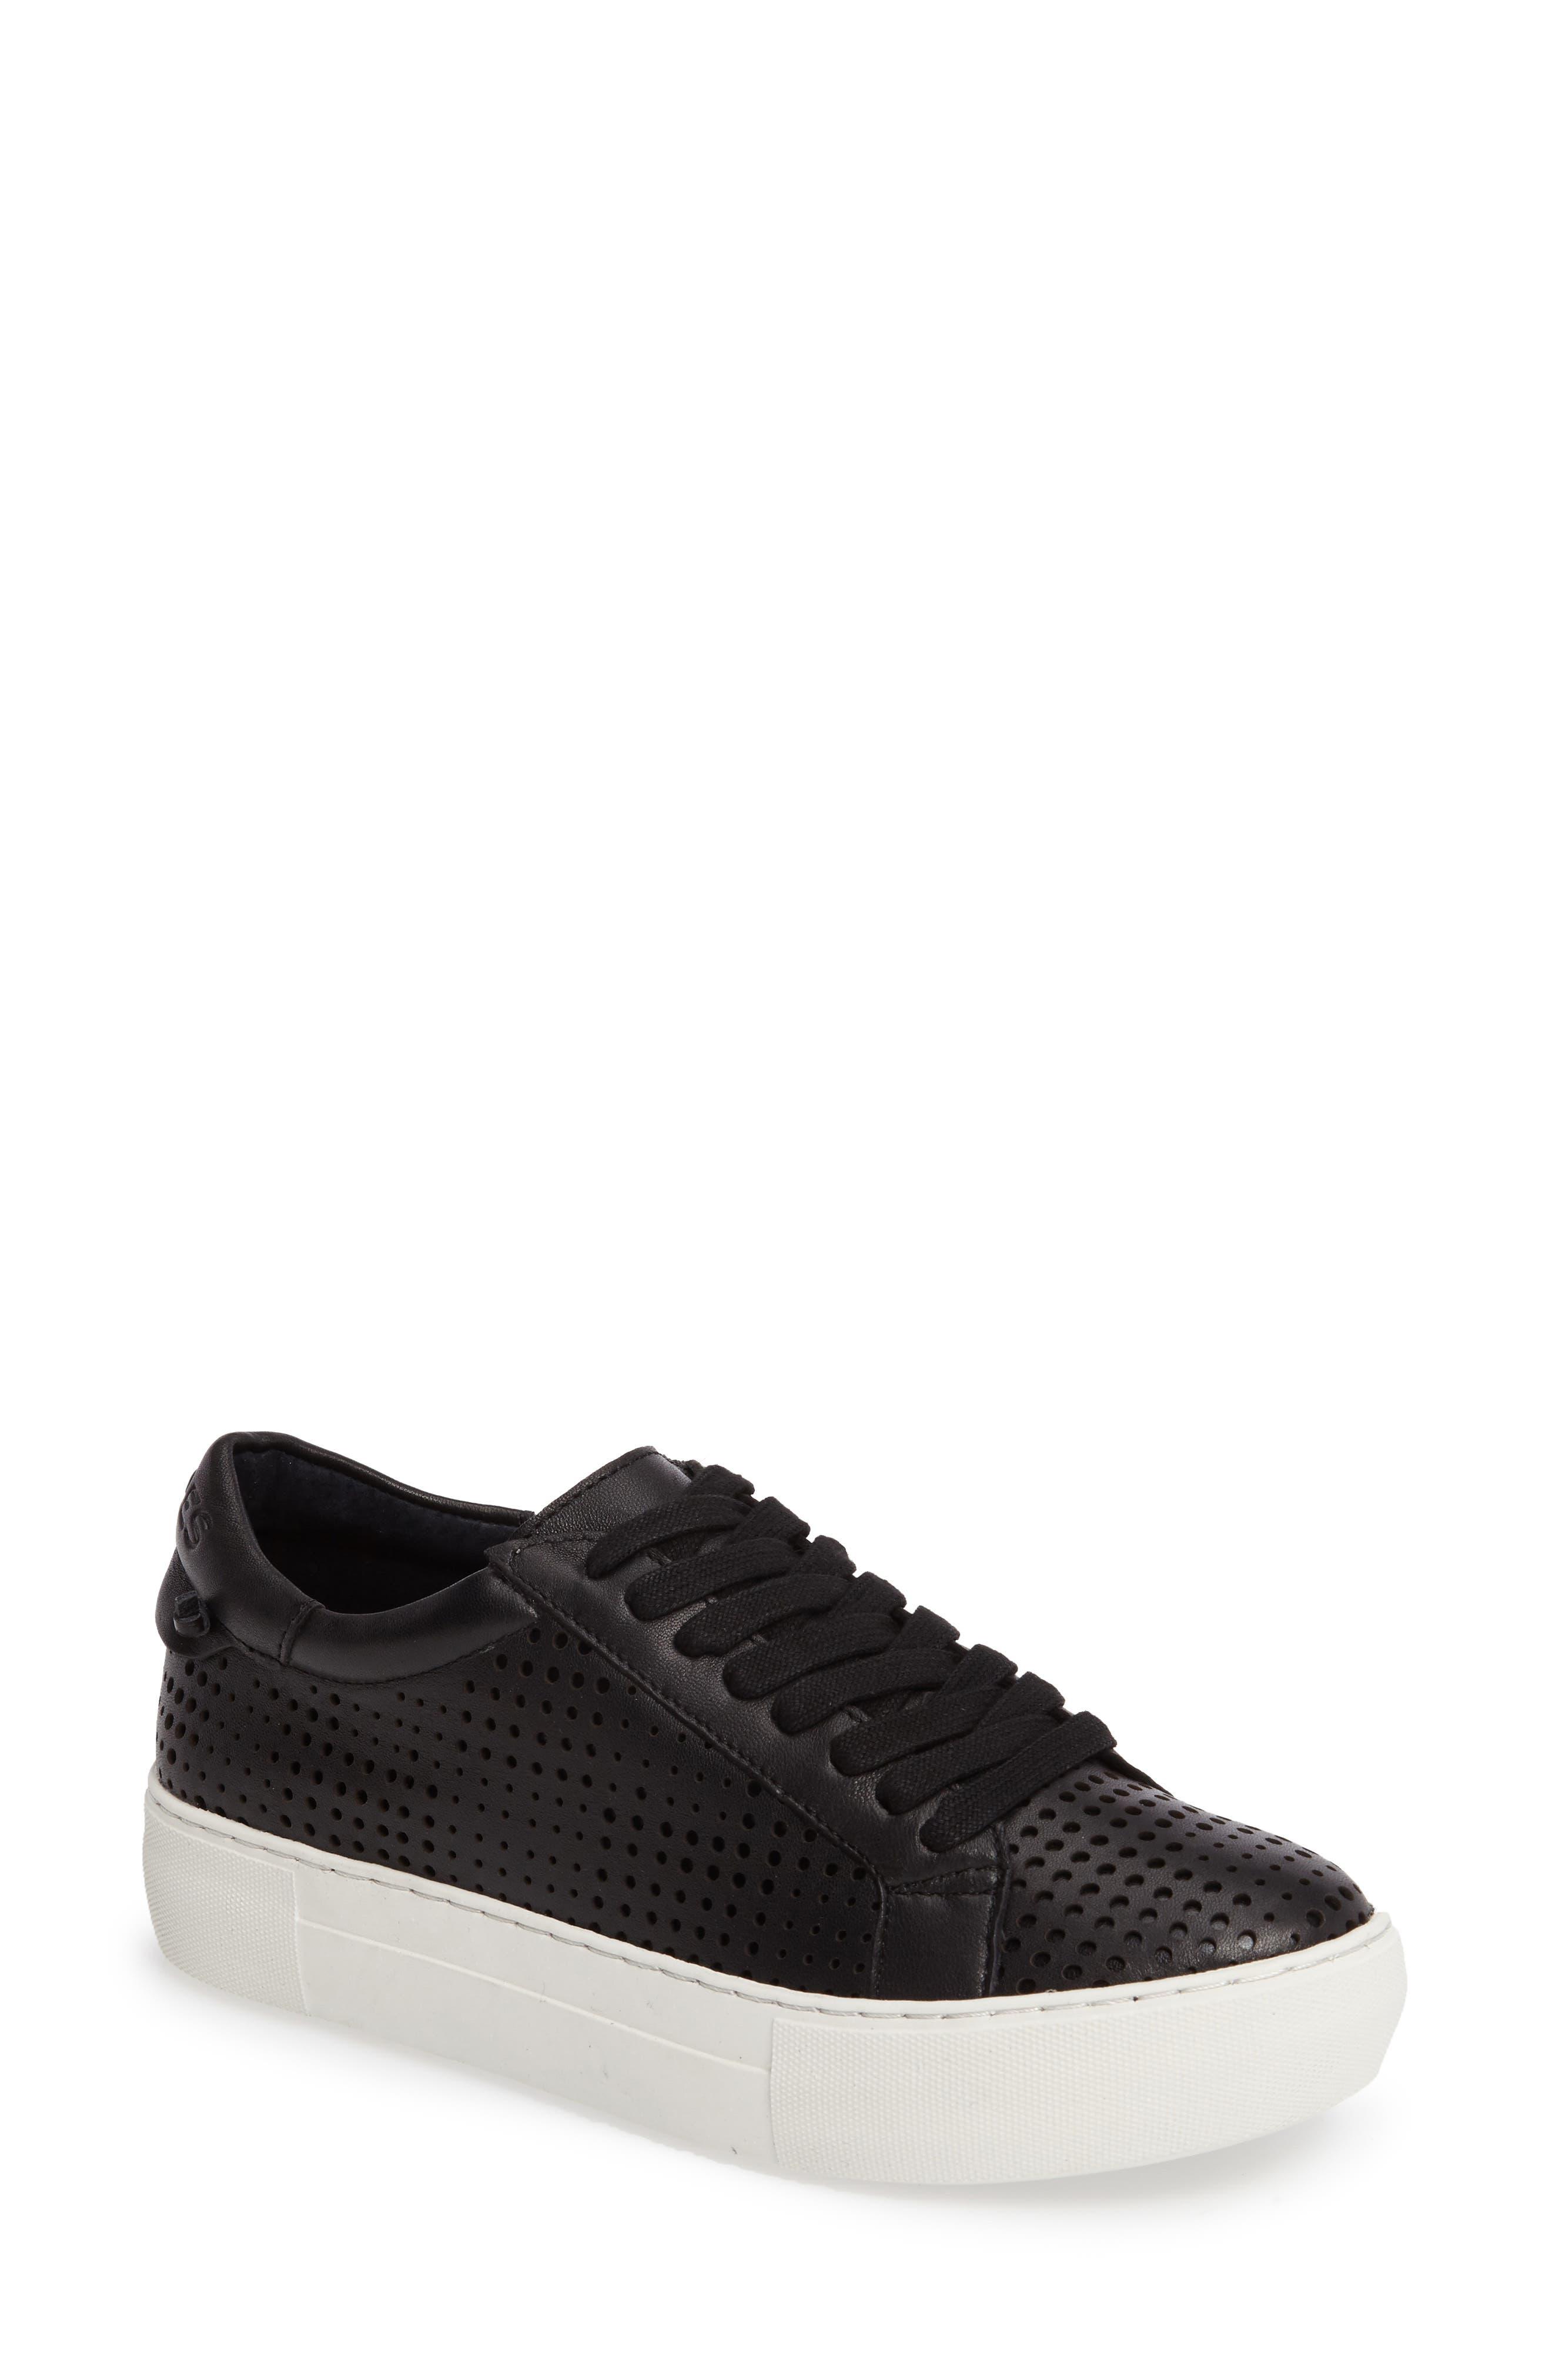 Audrina Platform Sneaker,                             Main thumbnail 1, color,                             015